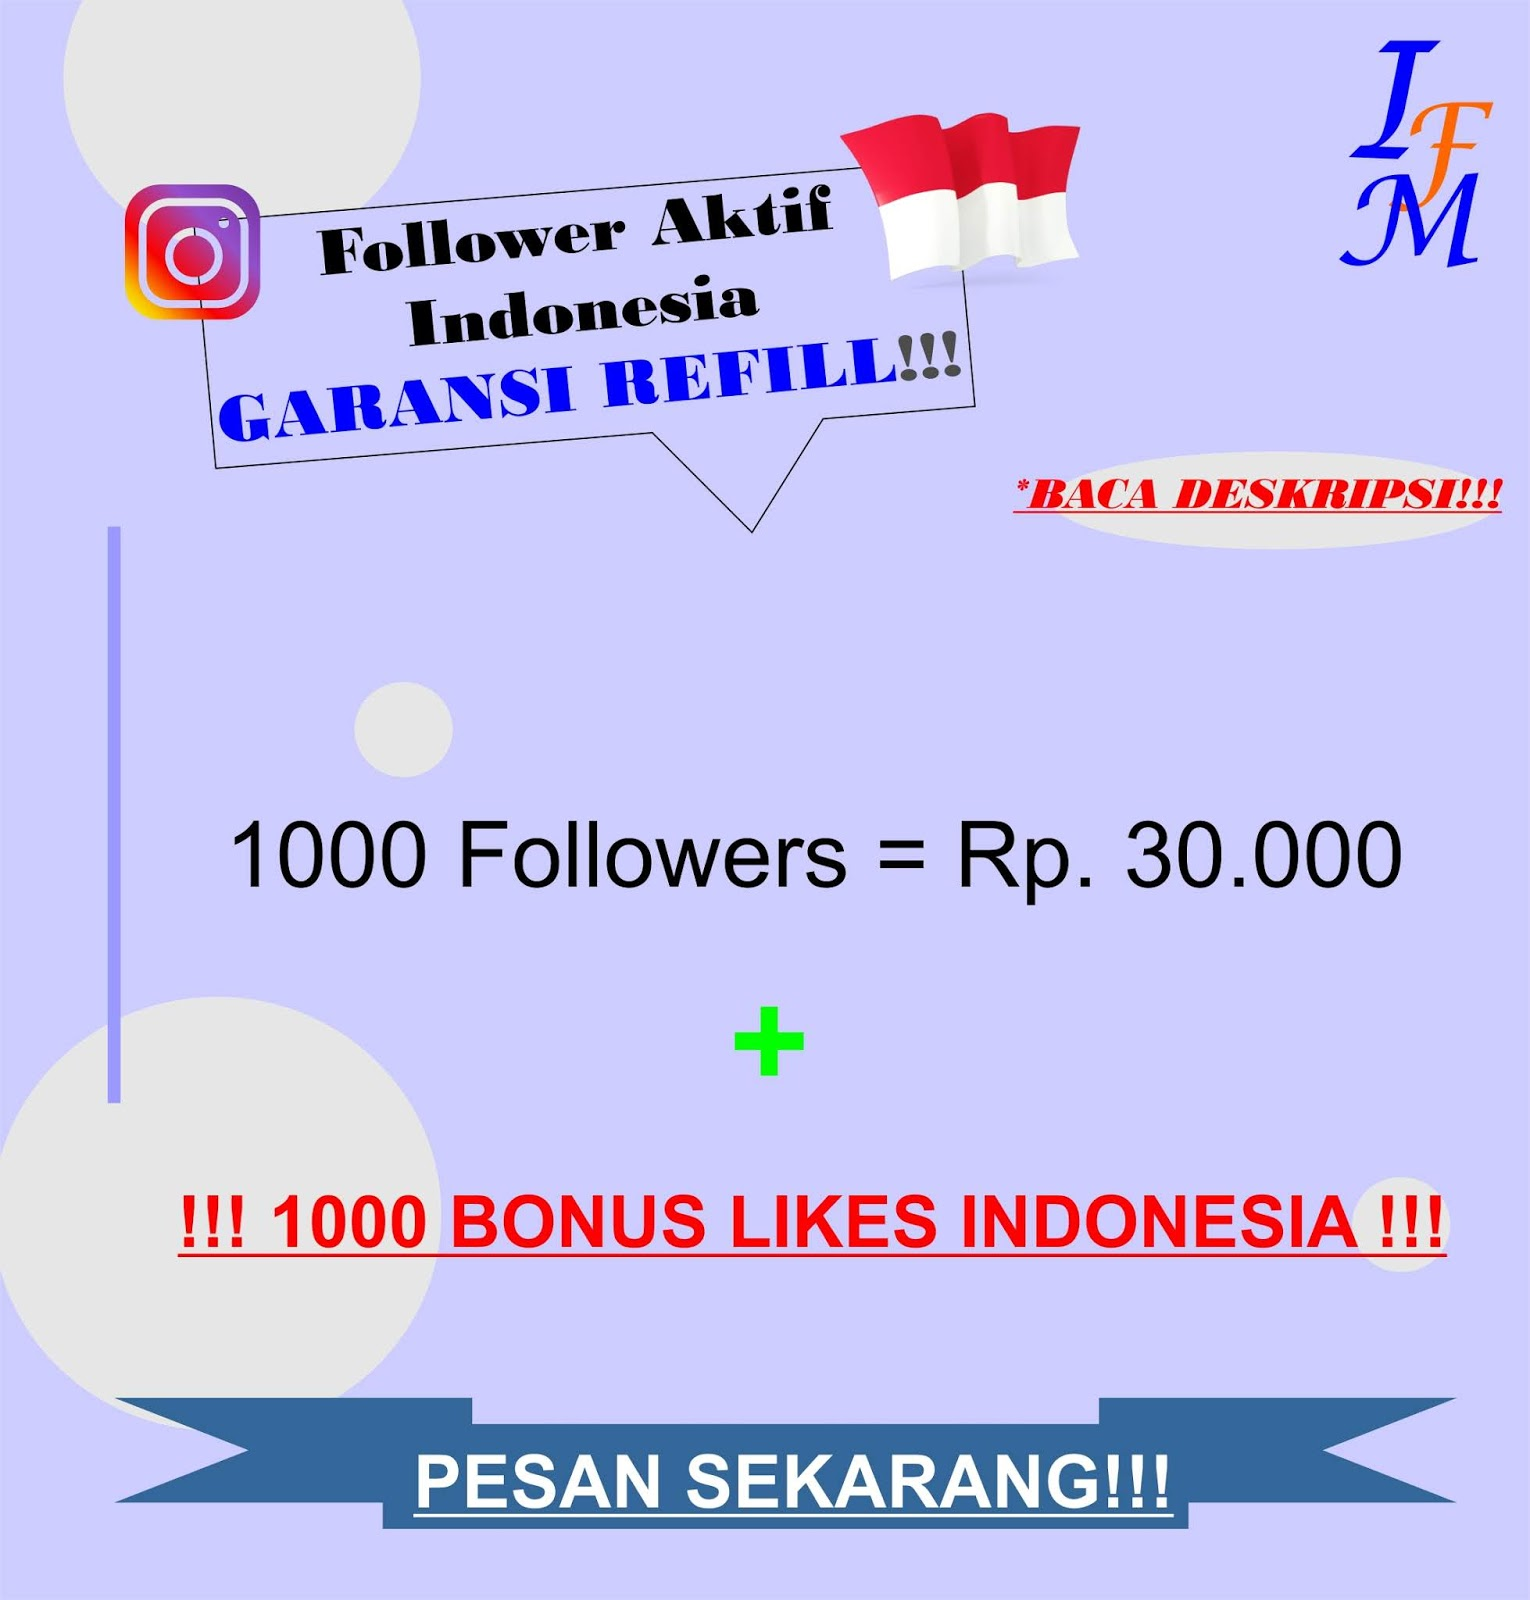 Jasa Tambah 1000 Follower Akun Instagram Aktif Indonesia Murah Garansi Refill